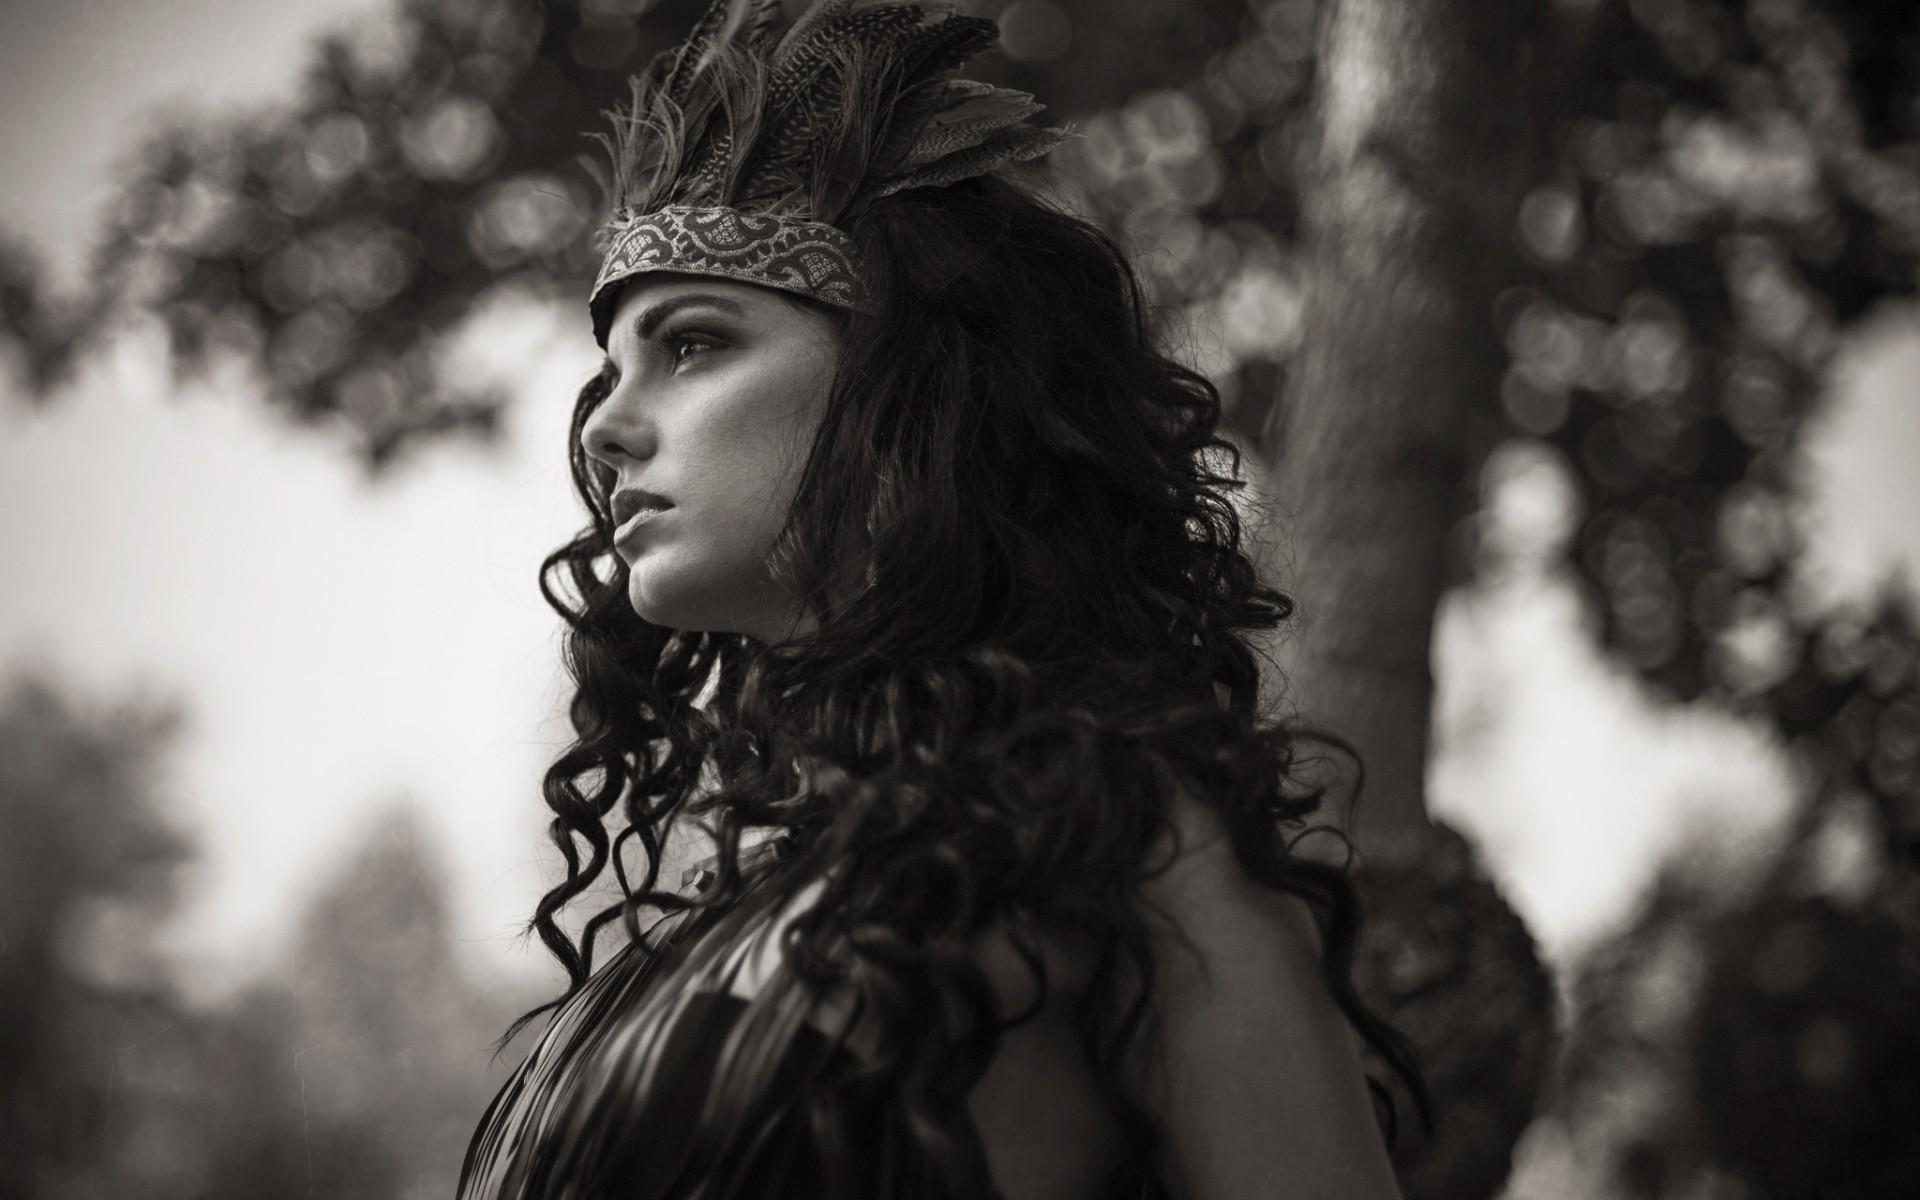 Remarkable, very long hair native american women speaking, would